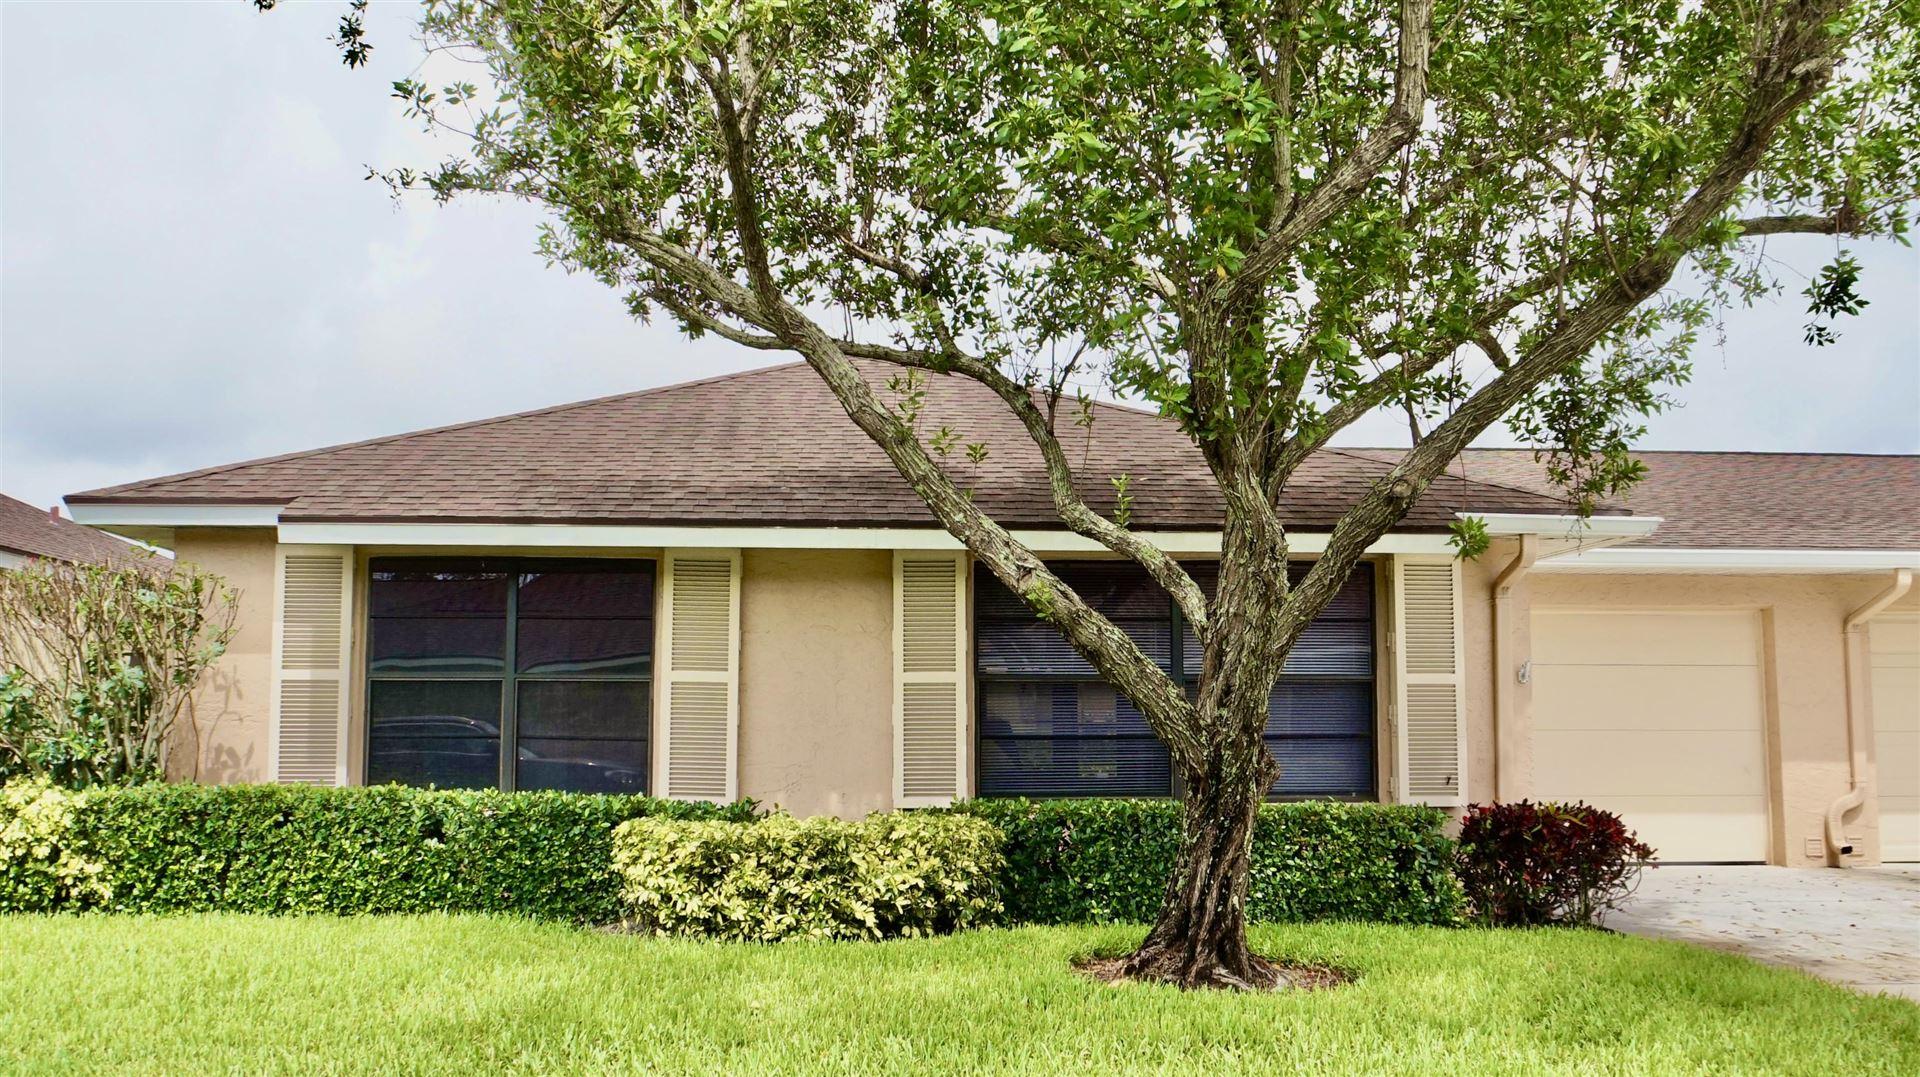 4185 Mango Tree Court #A, Boynton Beach, FL 33436 - #: RX-10628519